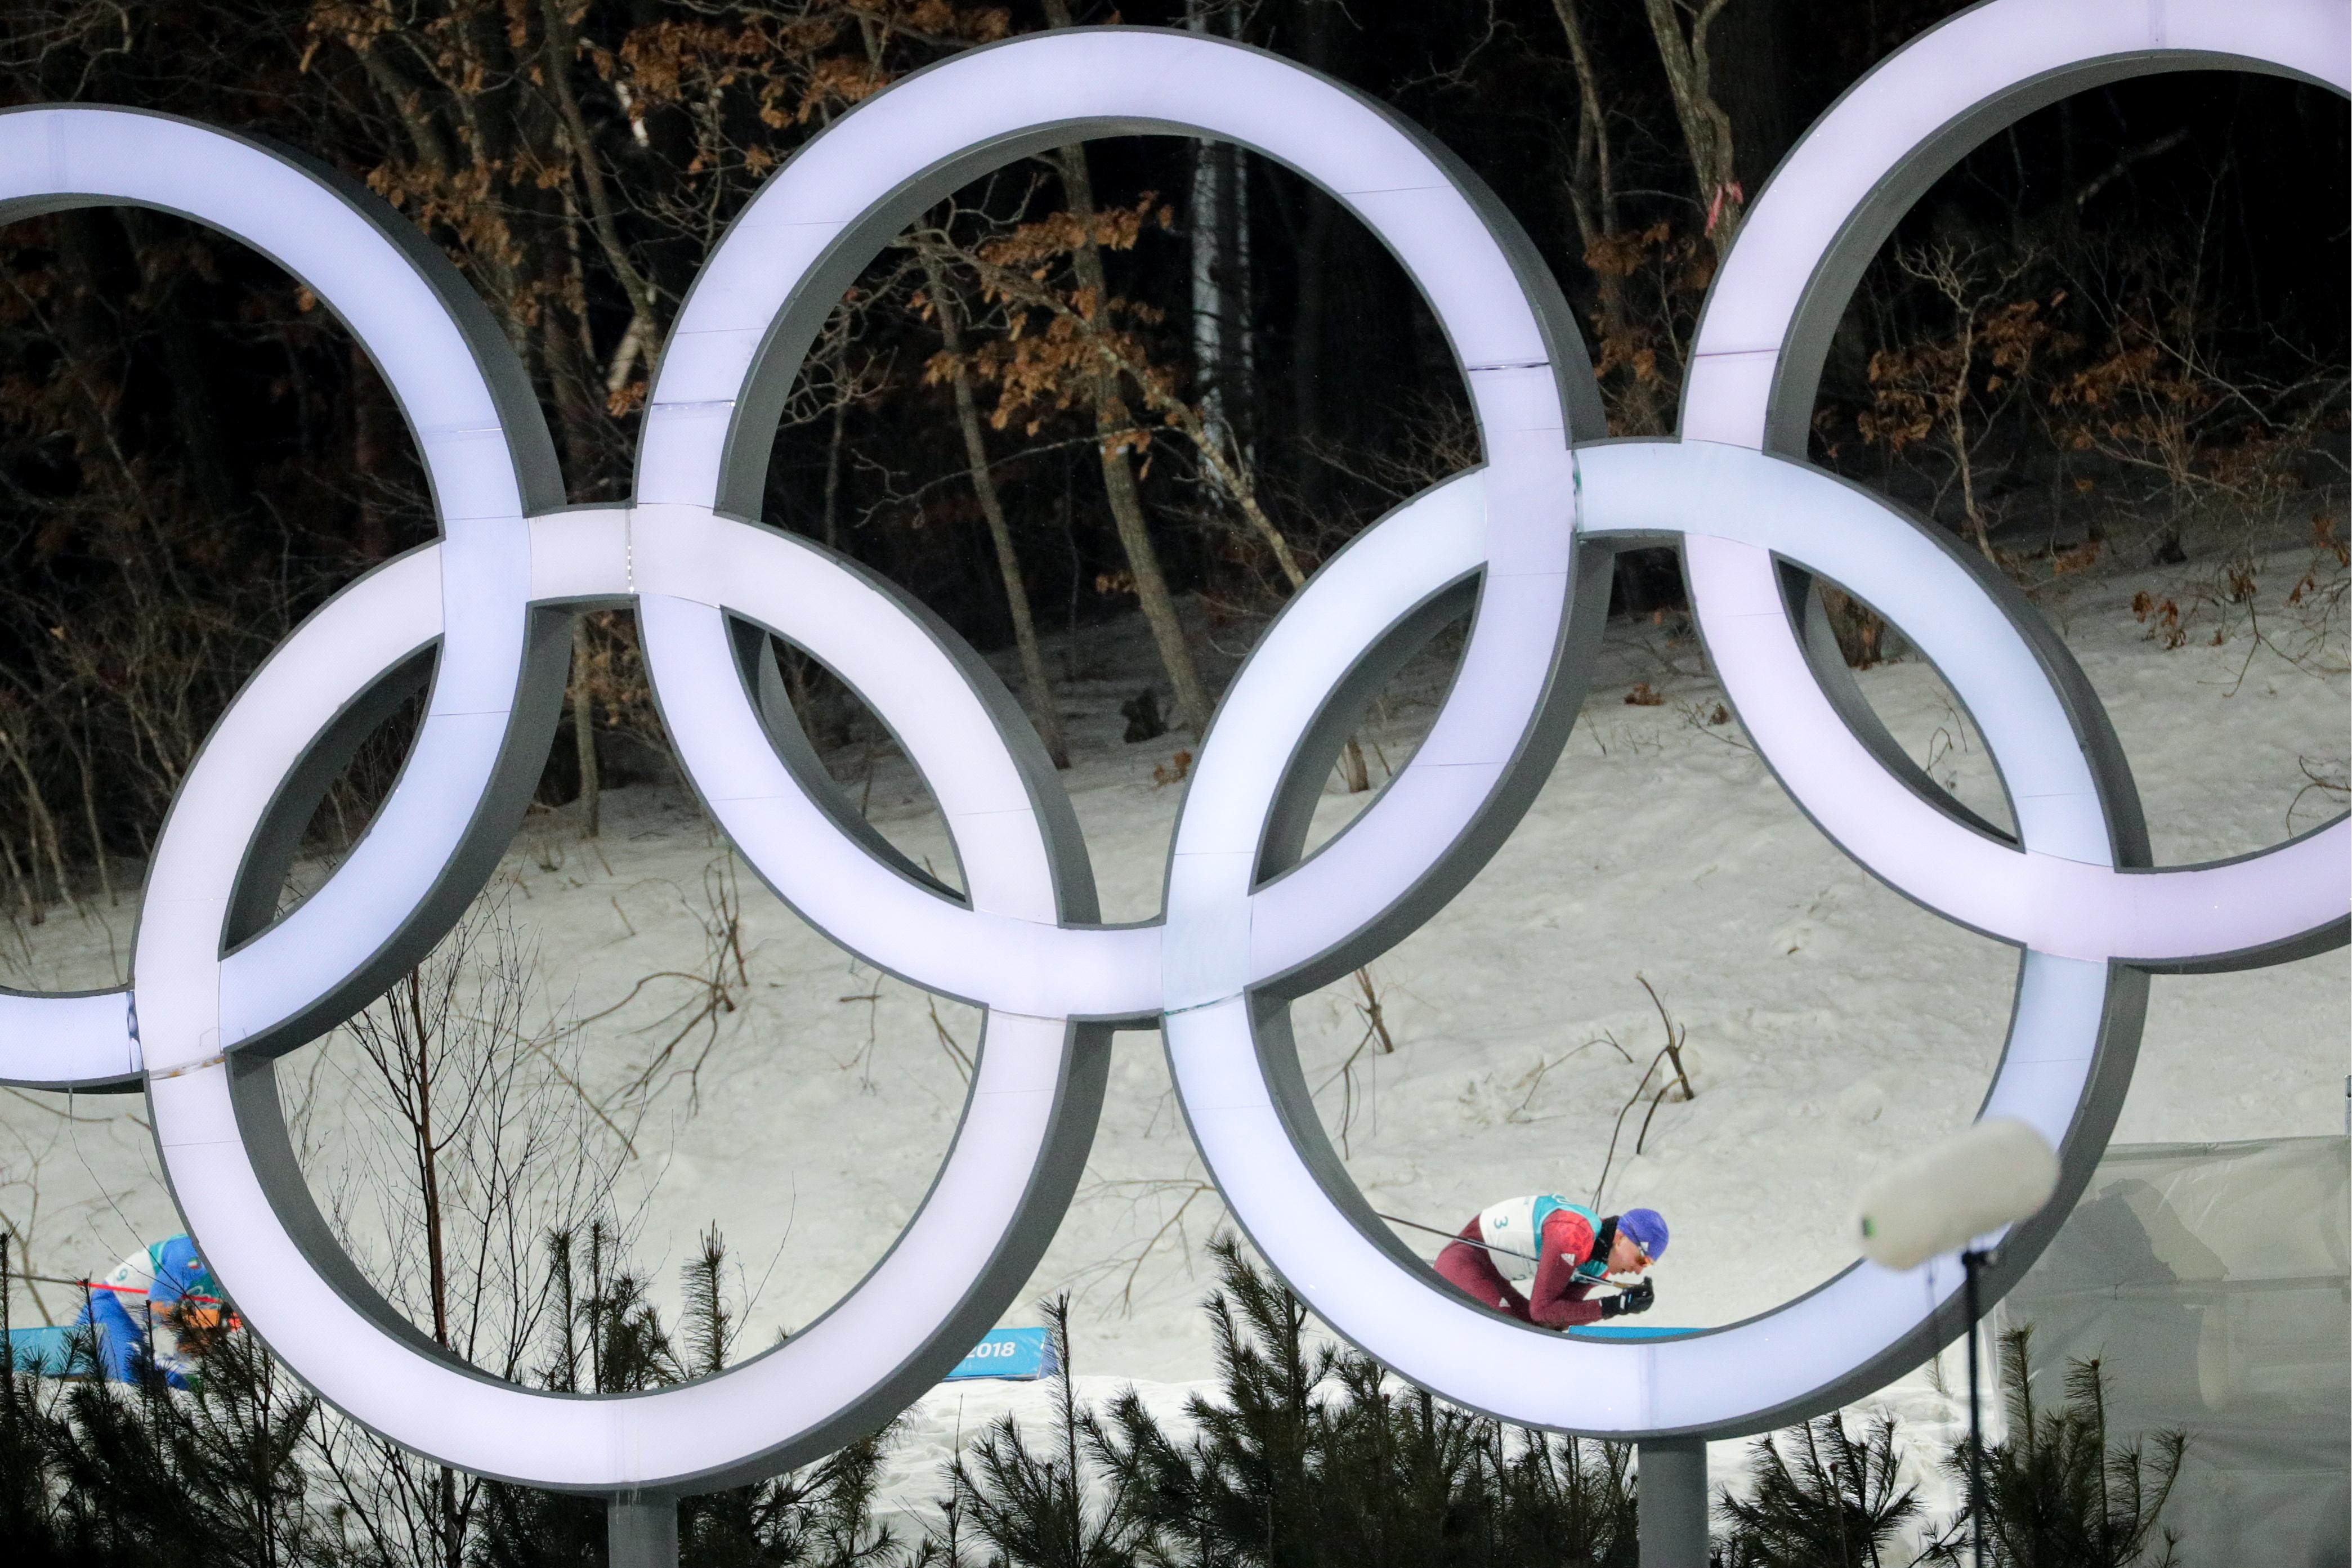 PyeongChang 2018 Winter Olympics: cross-country skiing, men's individual classic sprint race